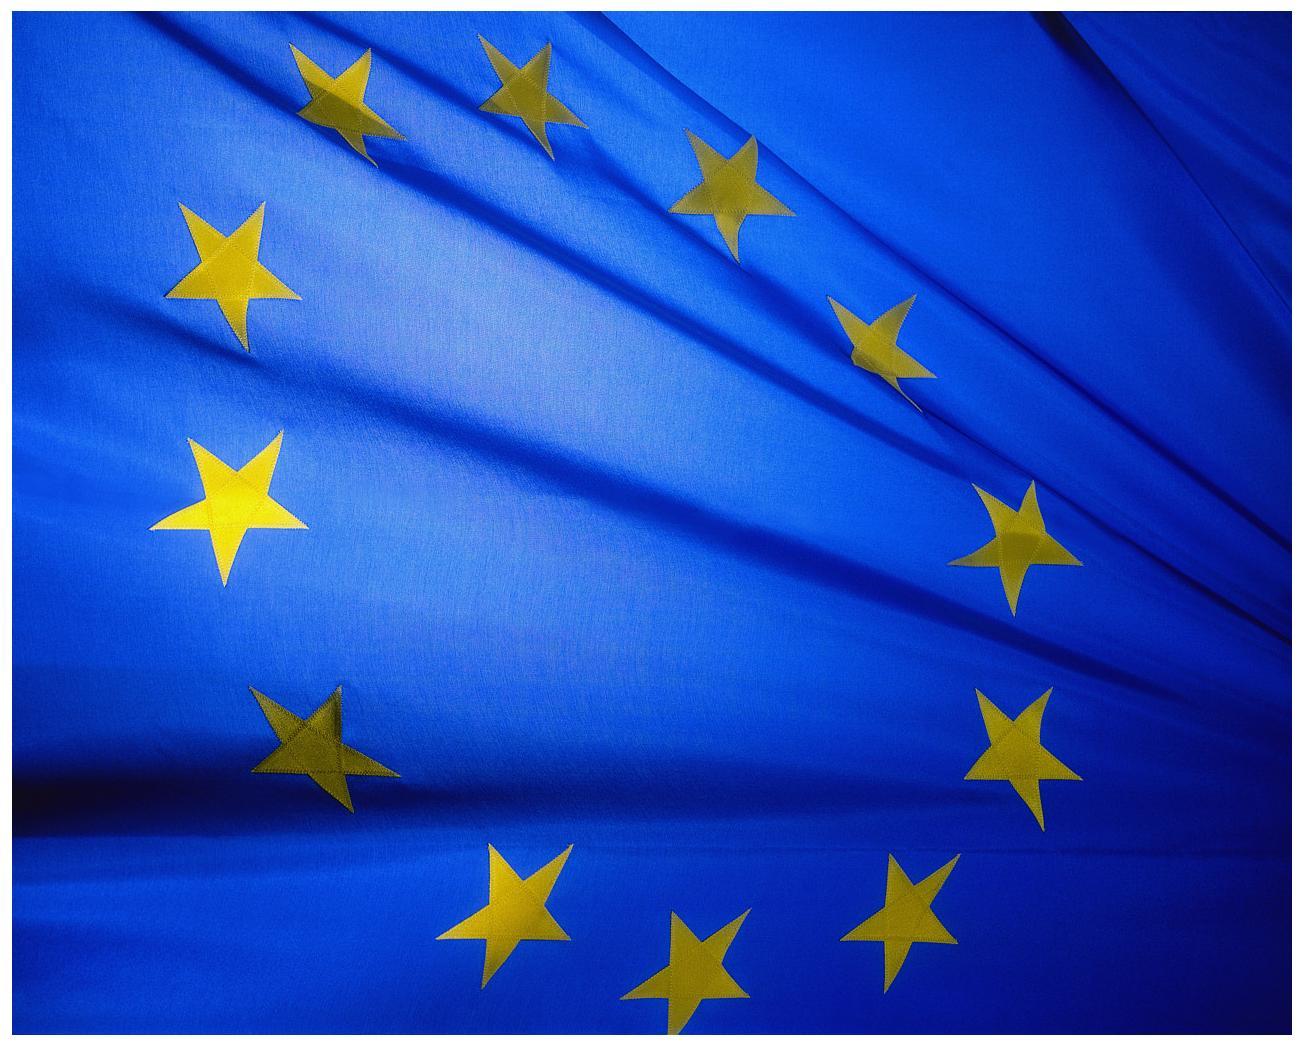 http://4.bp.blogspot.com/_S93o6OELzpc/TQxaj9RT9SI/AAAAAAAAAN0/sSBWFQ6kofk/s1600/European-Union-Flag-1.JPG